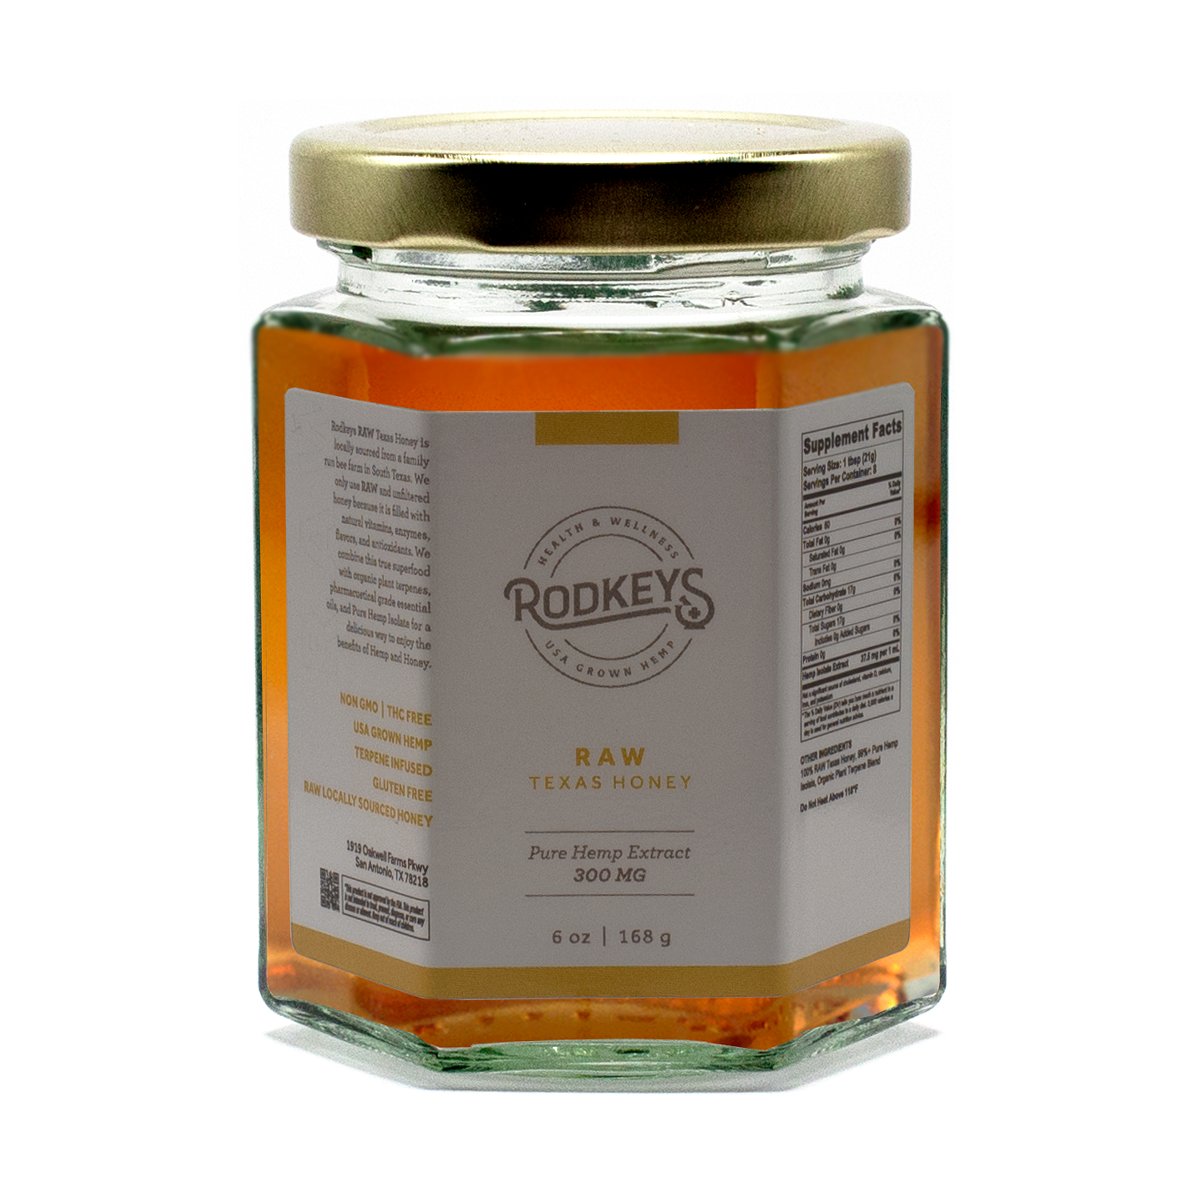 RAW Texas Honey